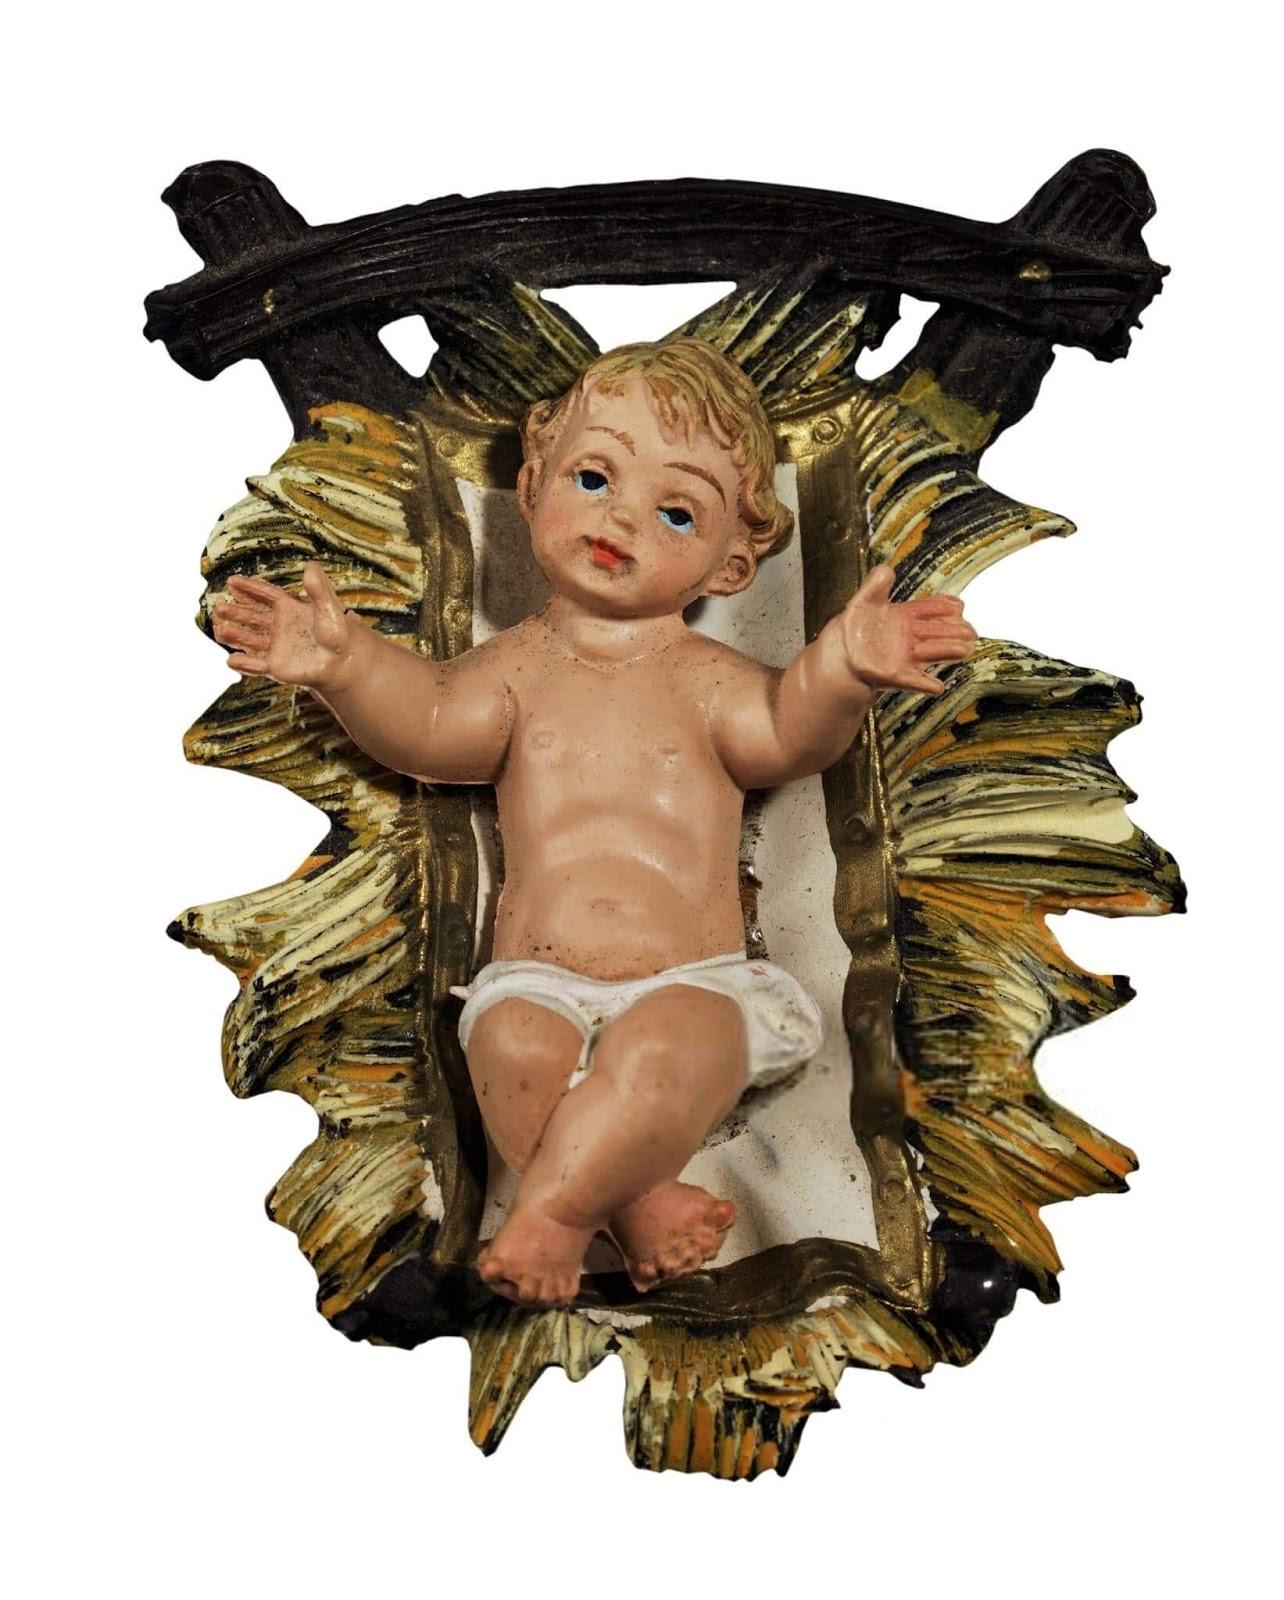 Nativity Scene Images